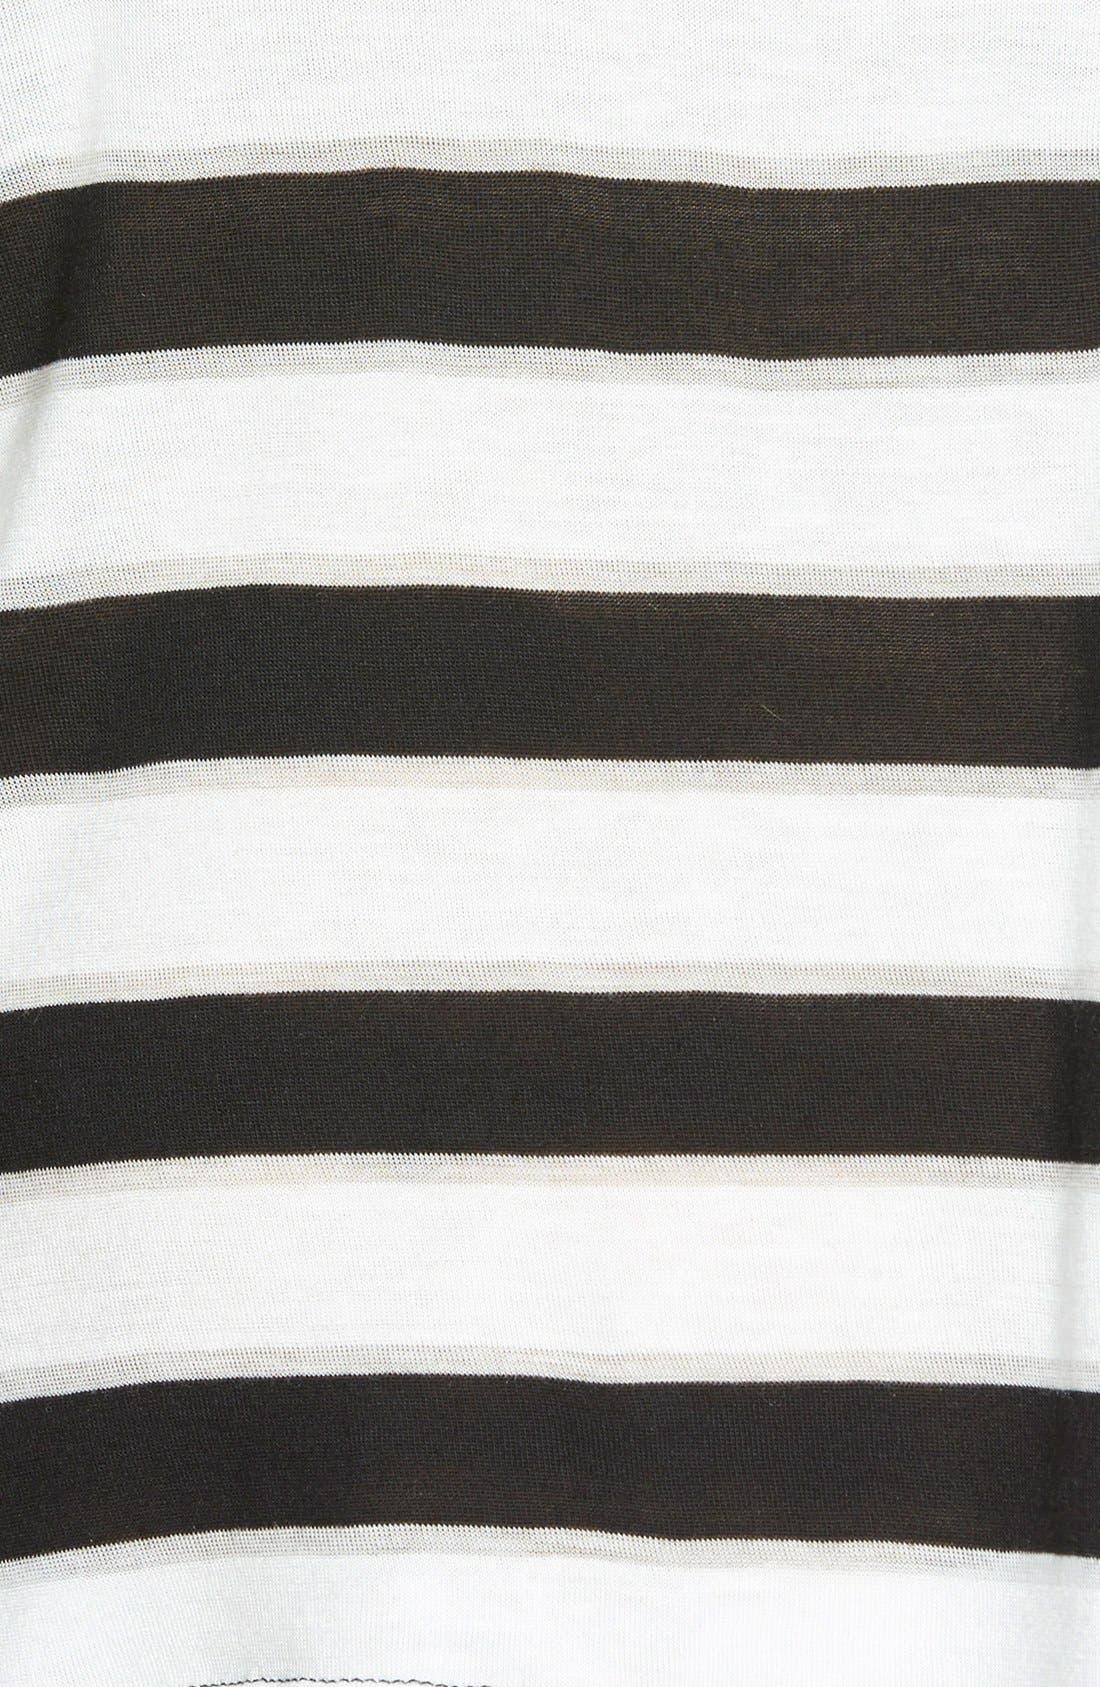 Stripe Short Sleeve Tee,                             Alternate thumbnail 2, color,                             001